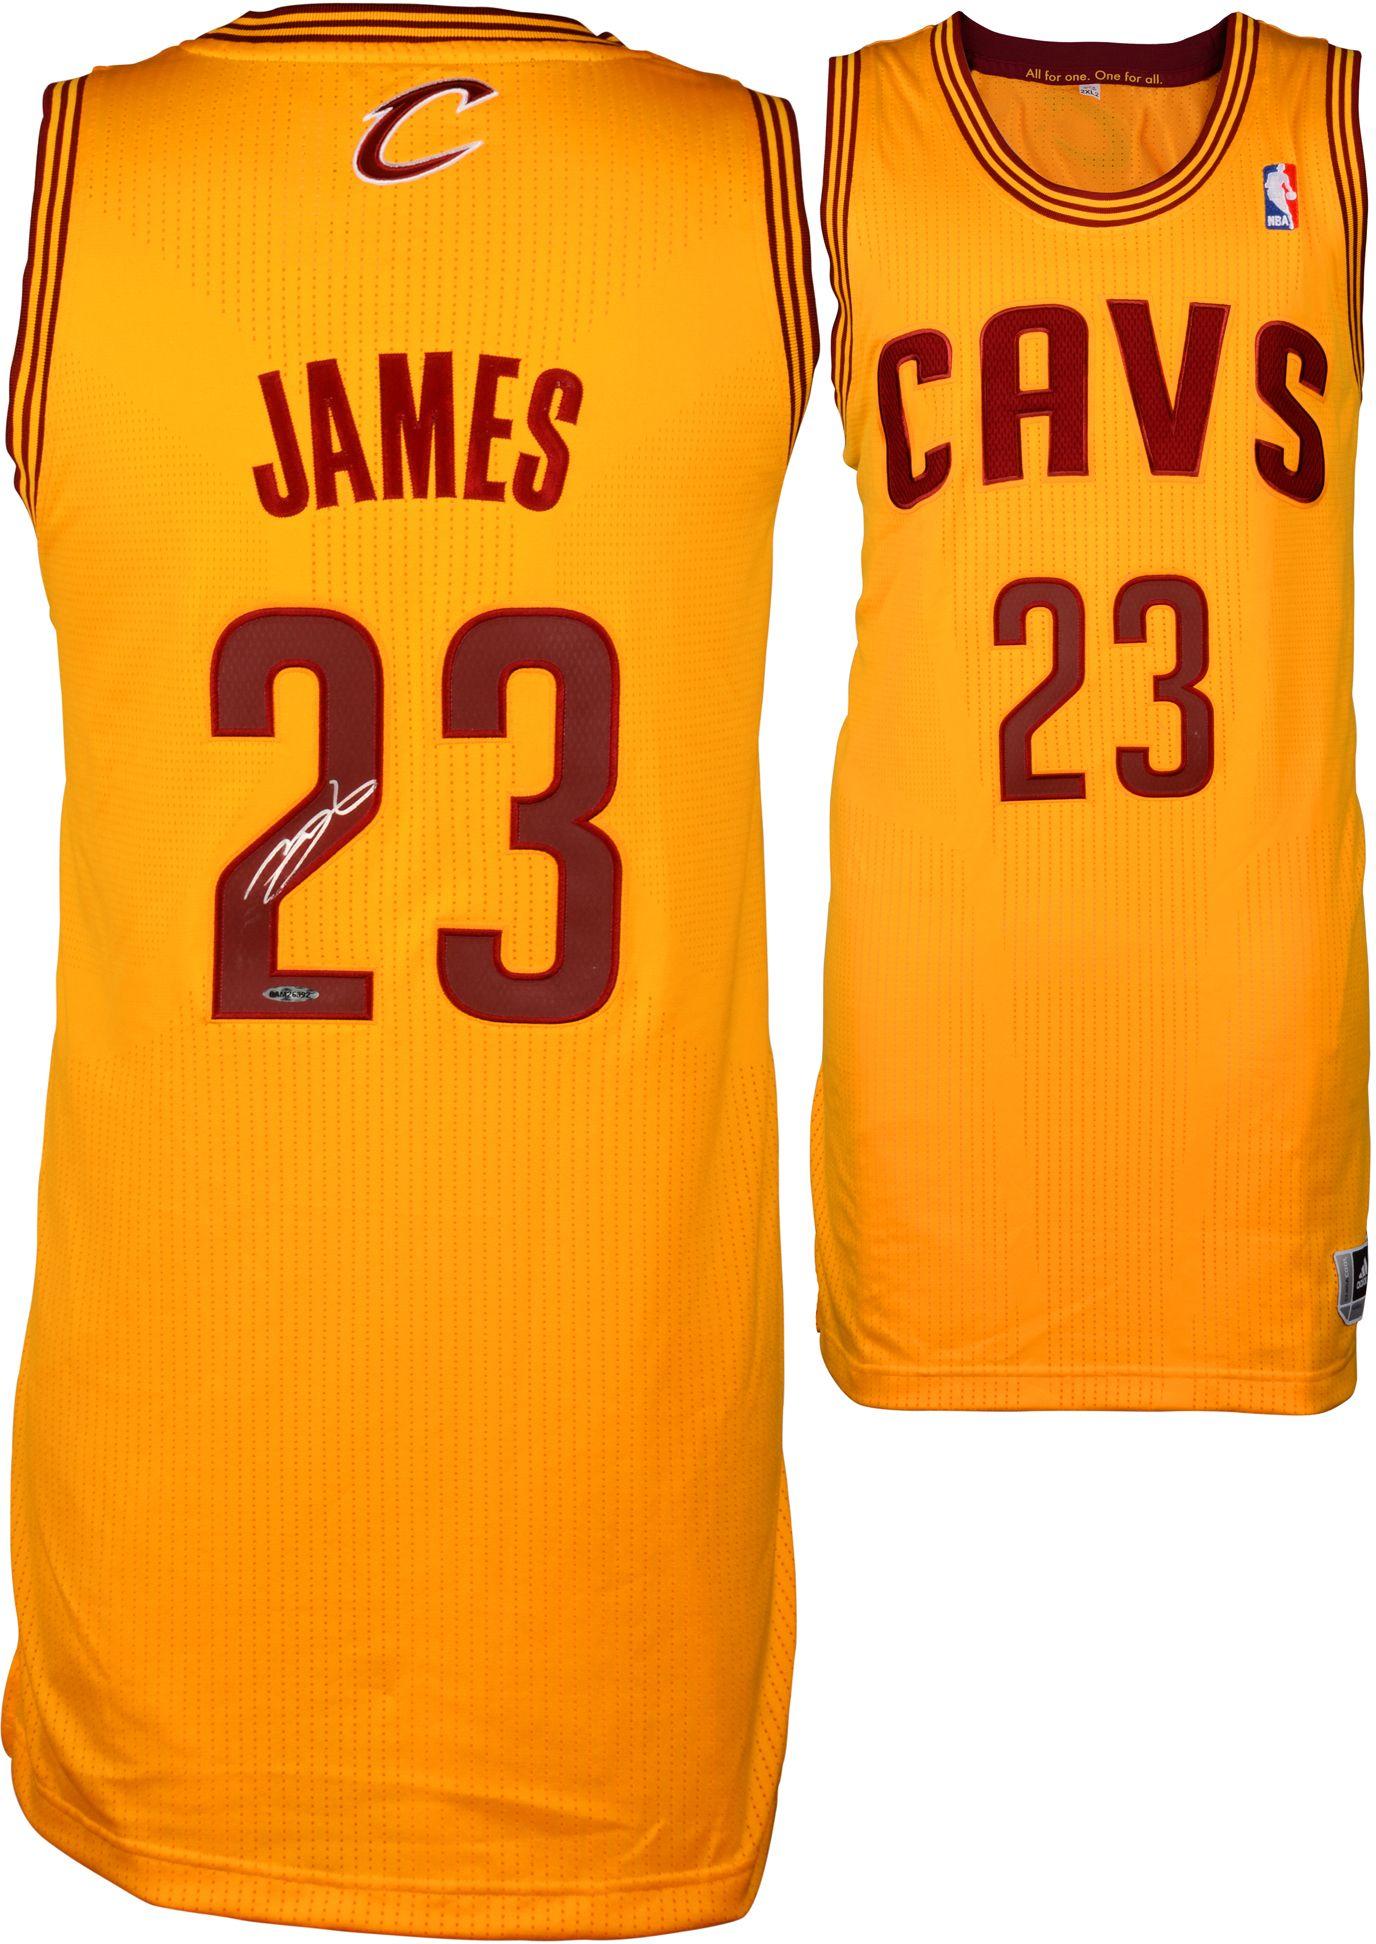 online store f177e 67d76 Autographed LeBron James Jersey - Alternate Gold UDA | Best ...